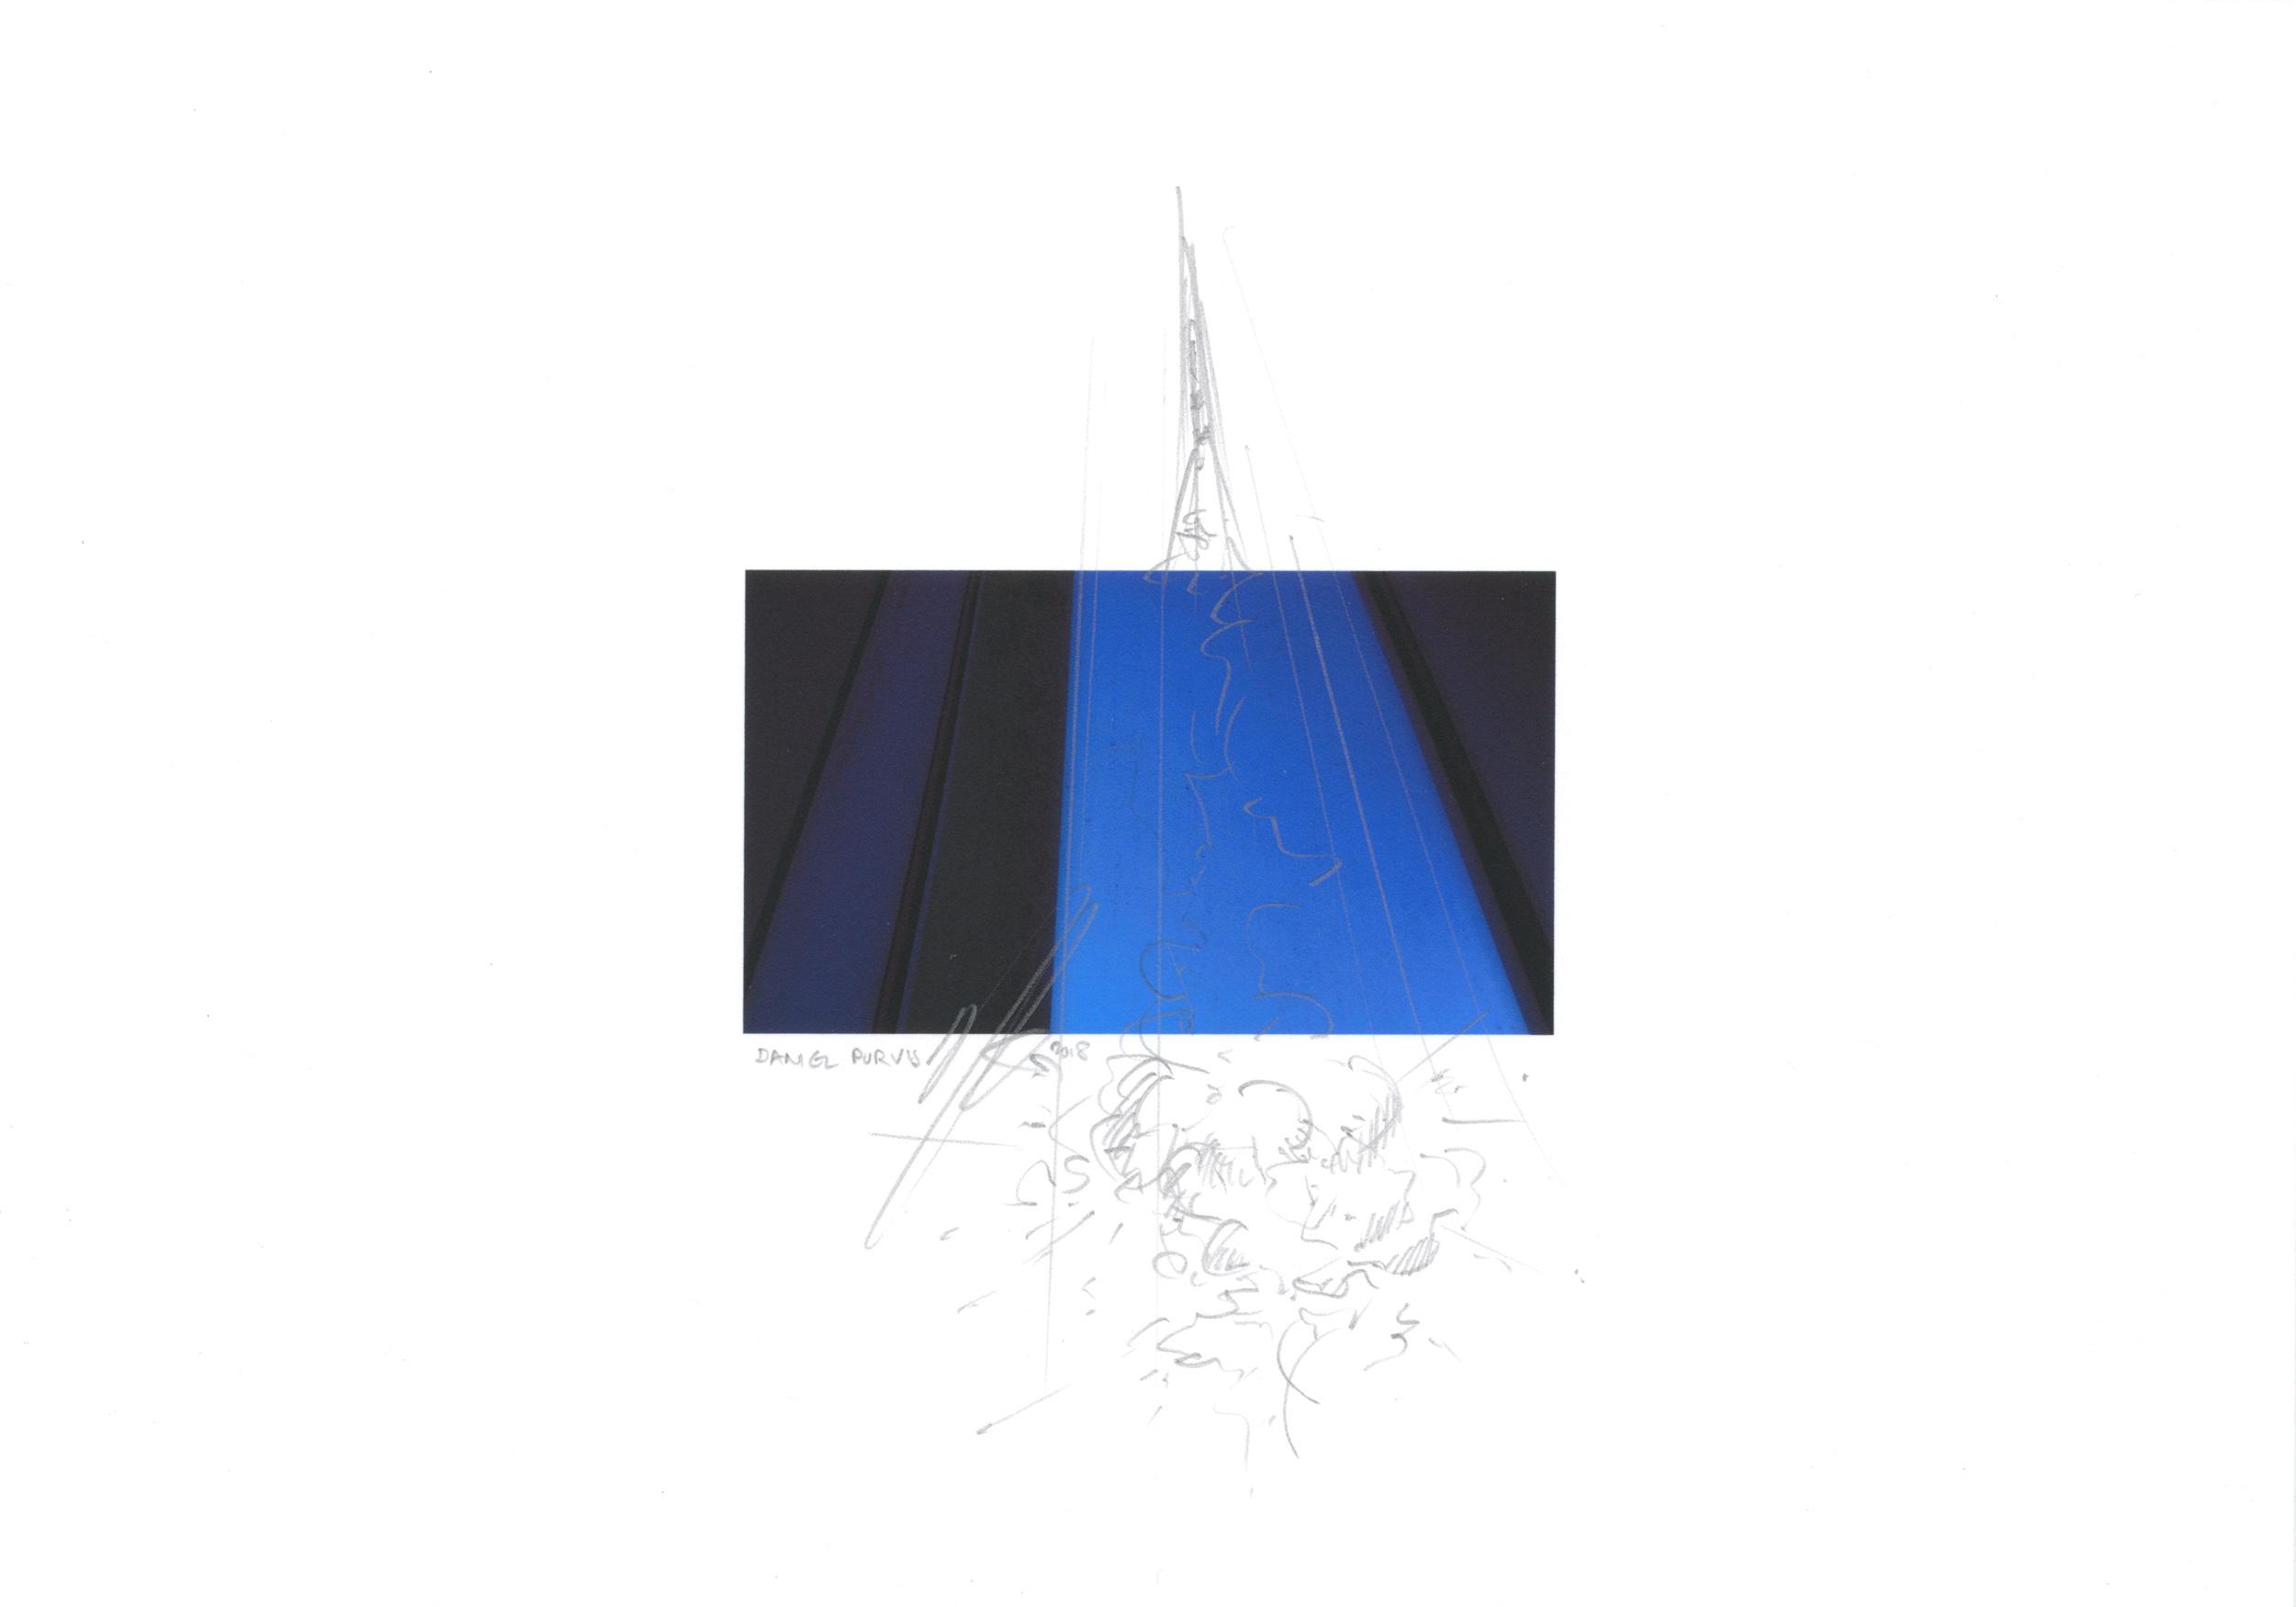 SkrambledEggs-DanielPurvis-BlueLines-20x14.jpg